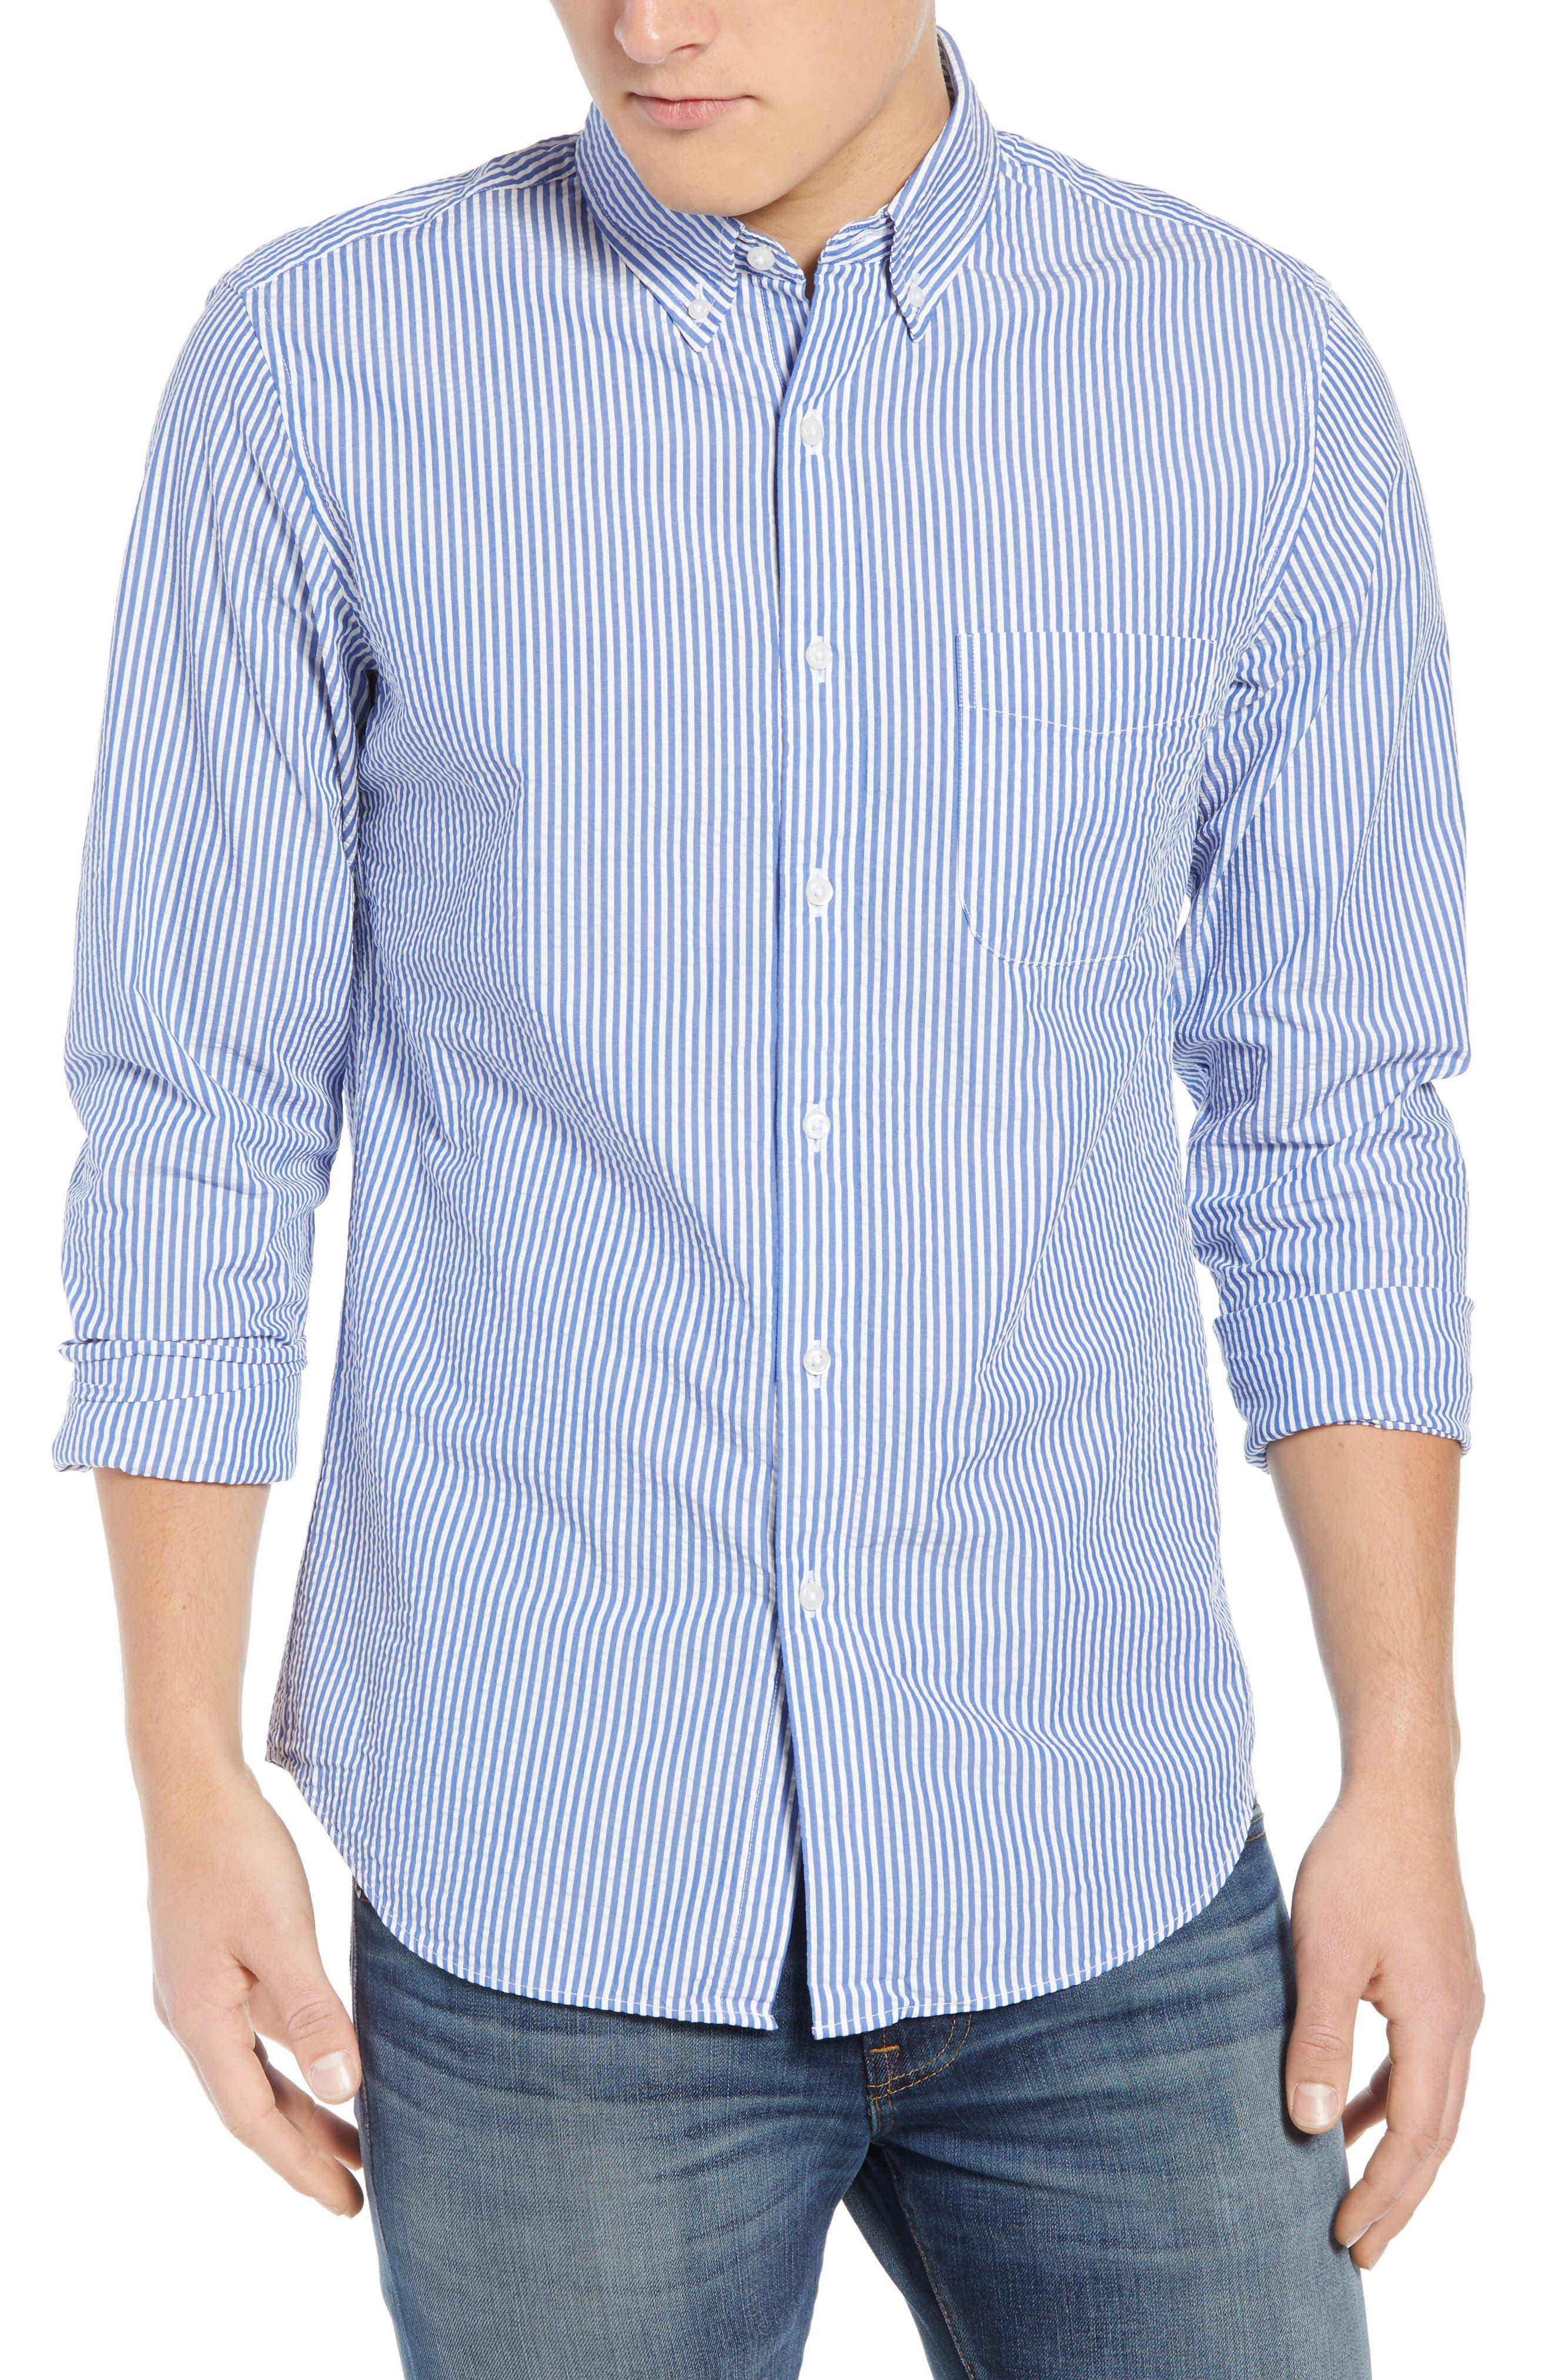 Seersucker Sport Shirt,                             Main thumbnail 1, color,                             White Blue